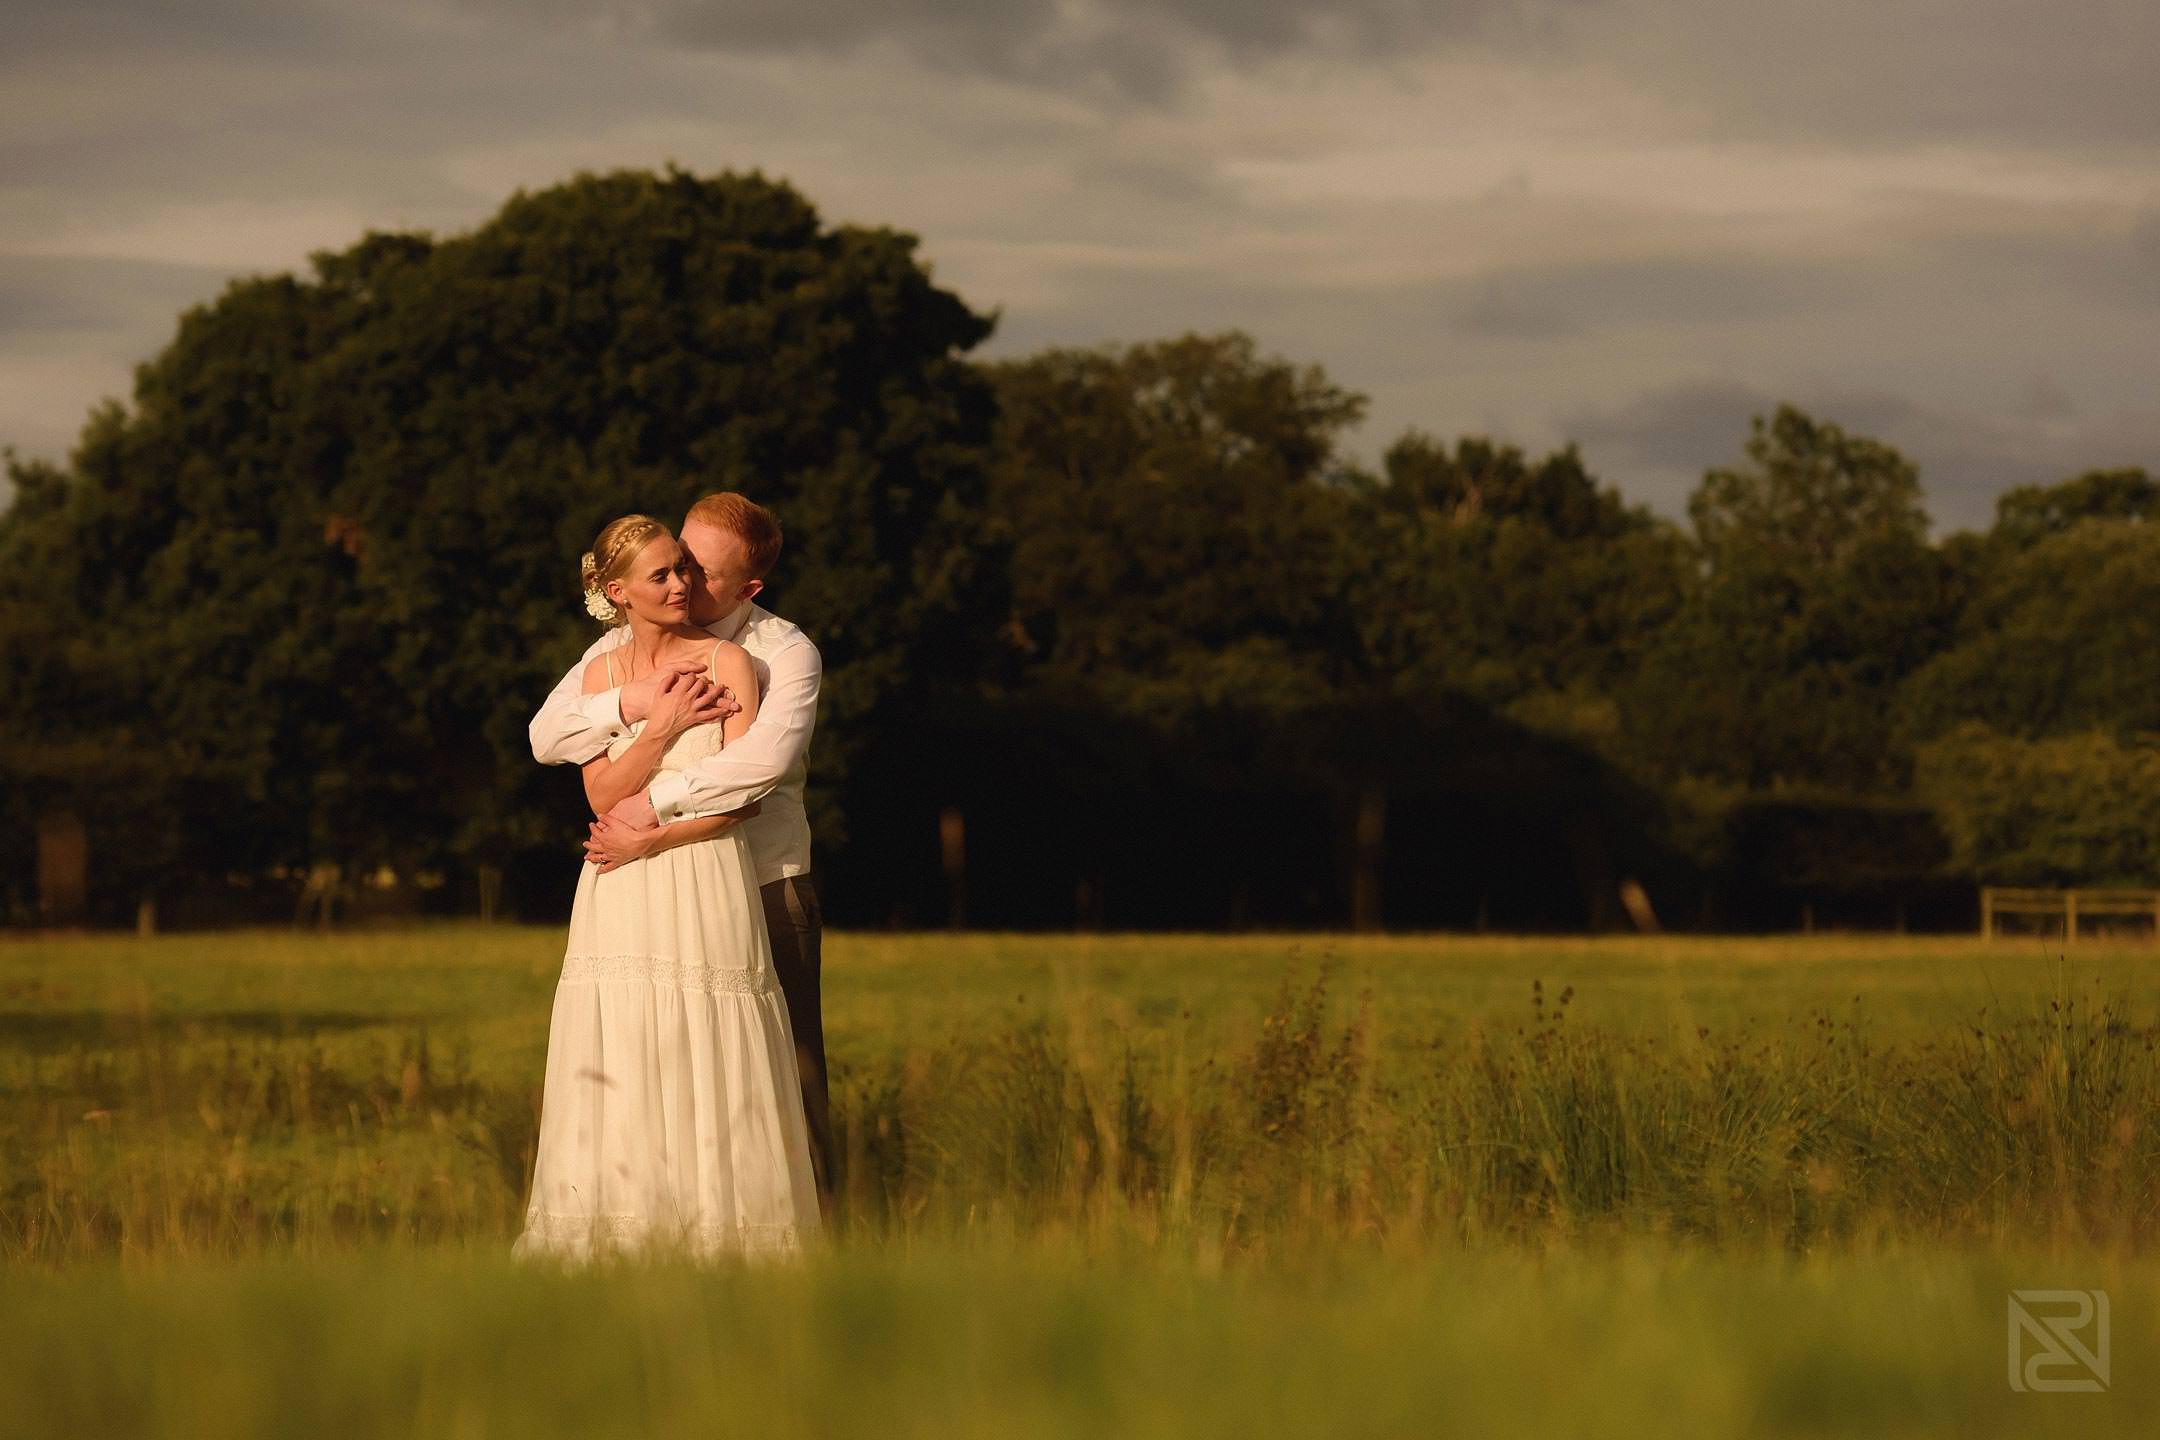 best-wedding-photographs-2015-053